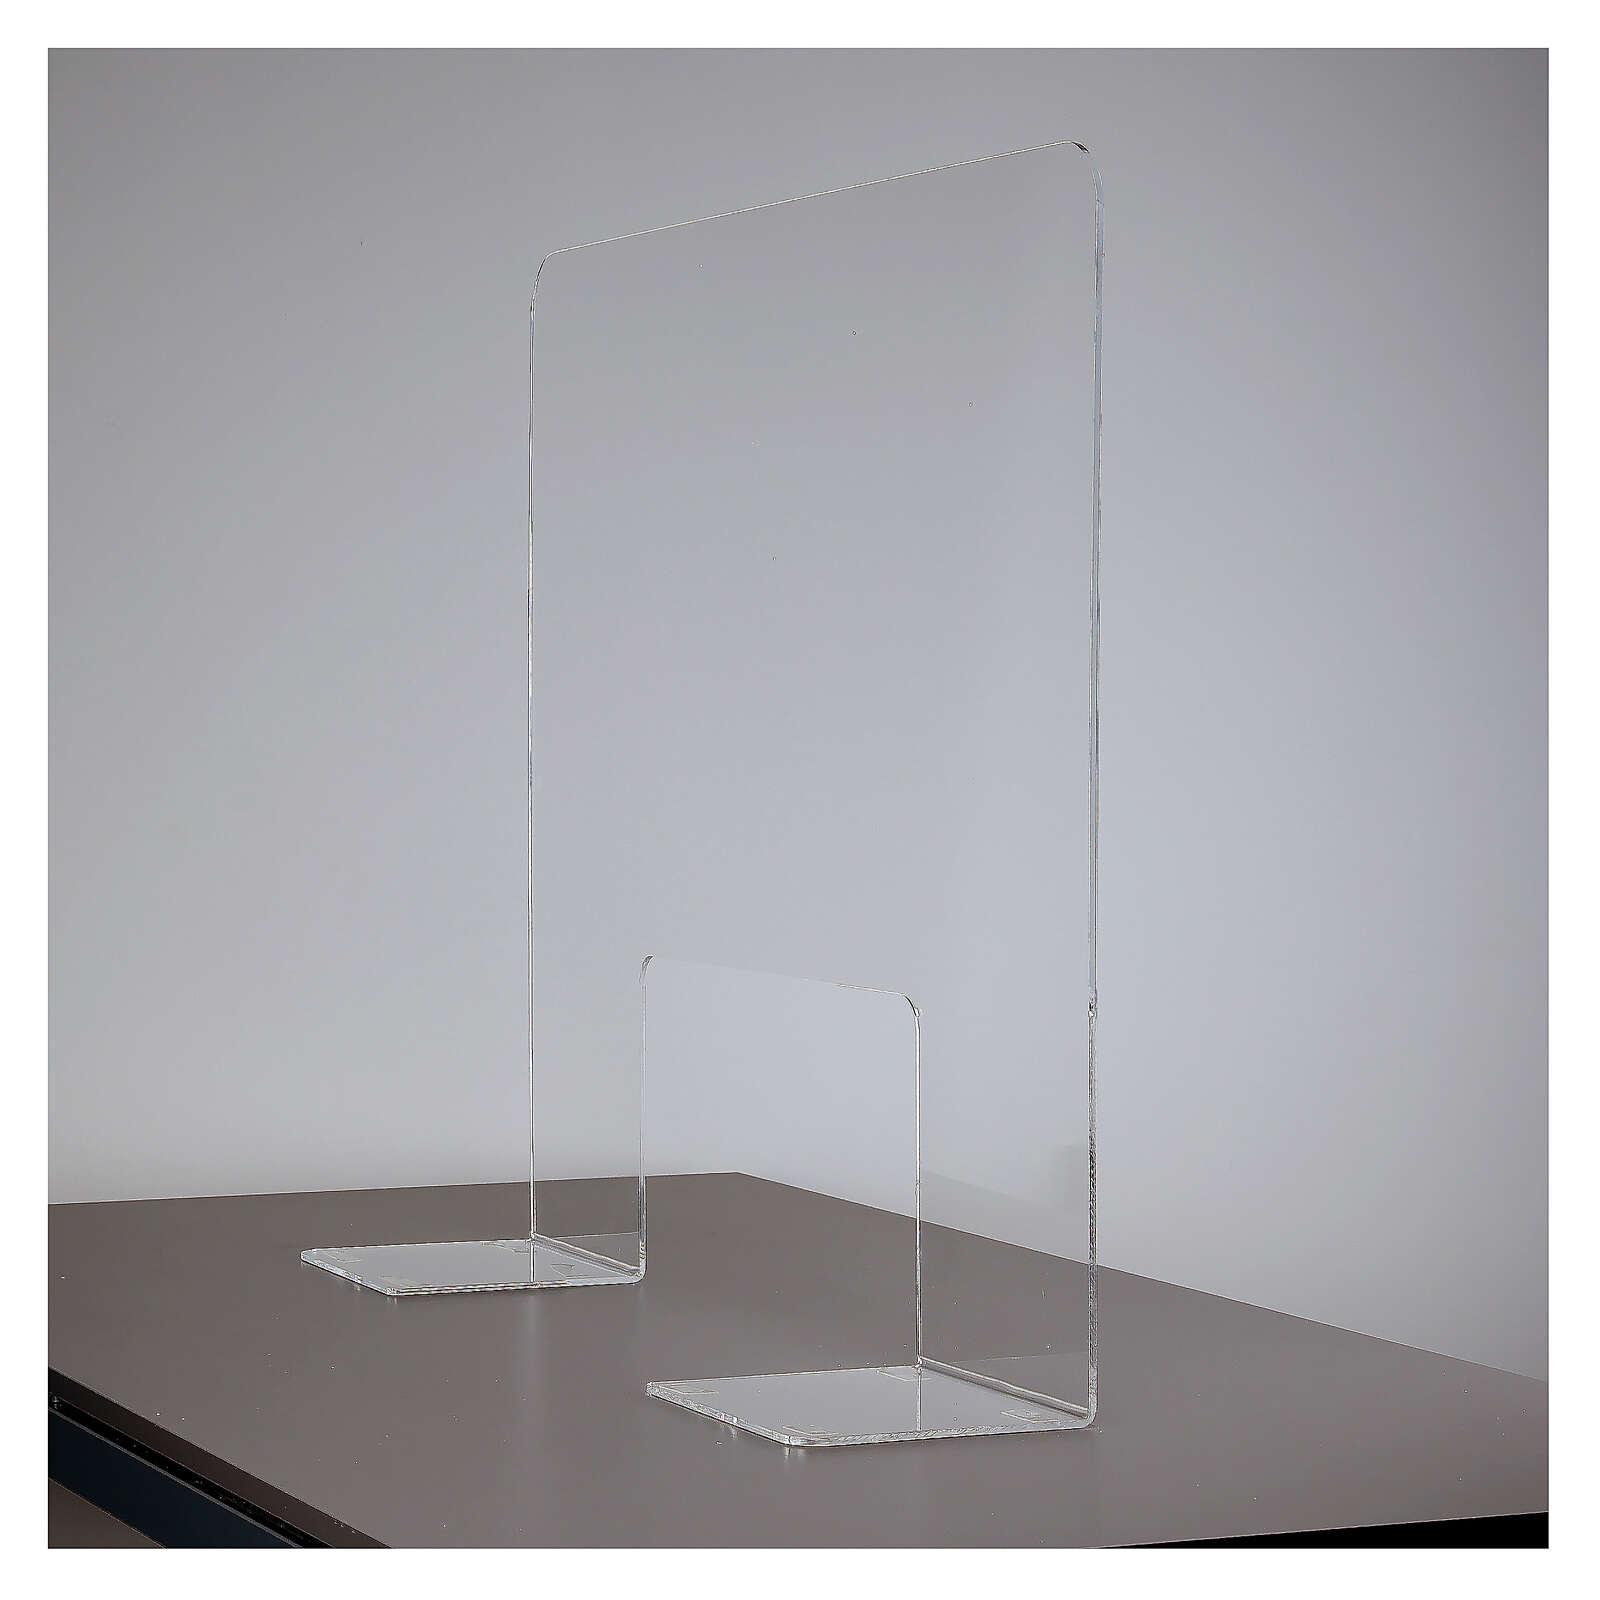 Plexiglass protection screen 65x100 cm thickness 8 mm 3